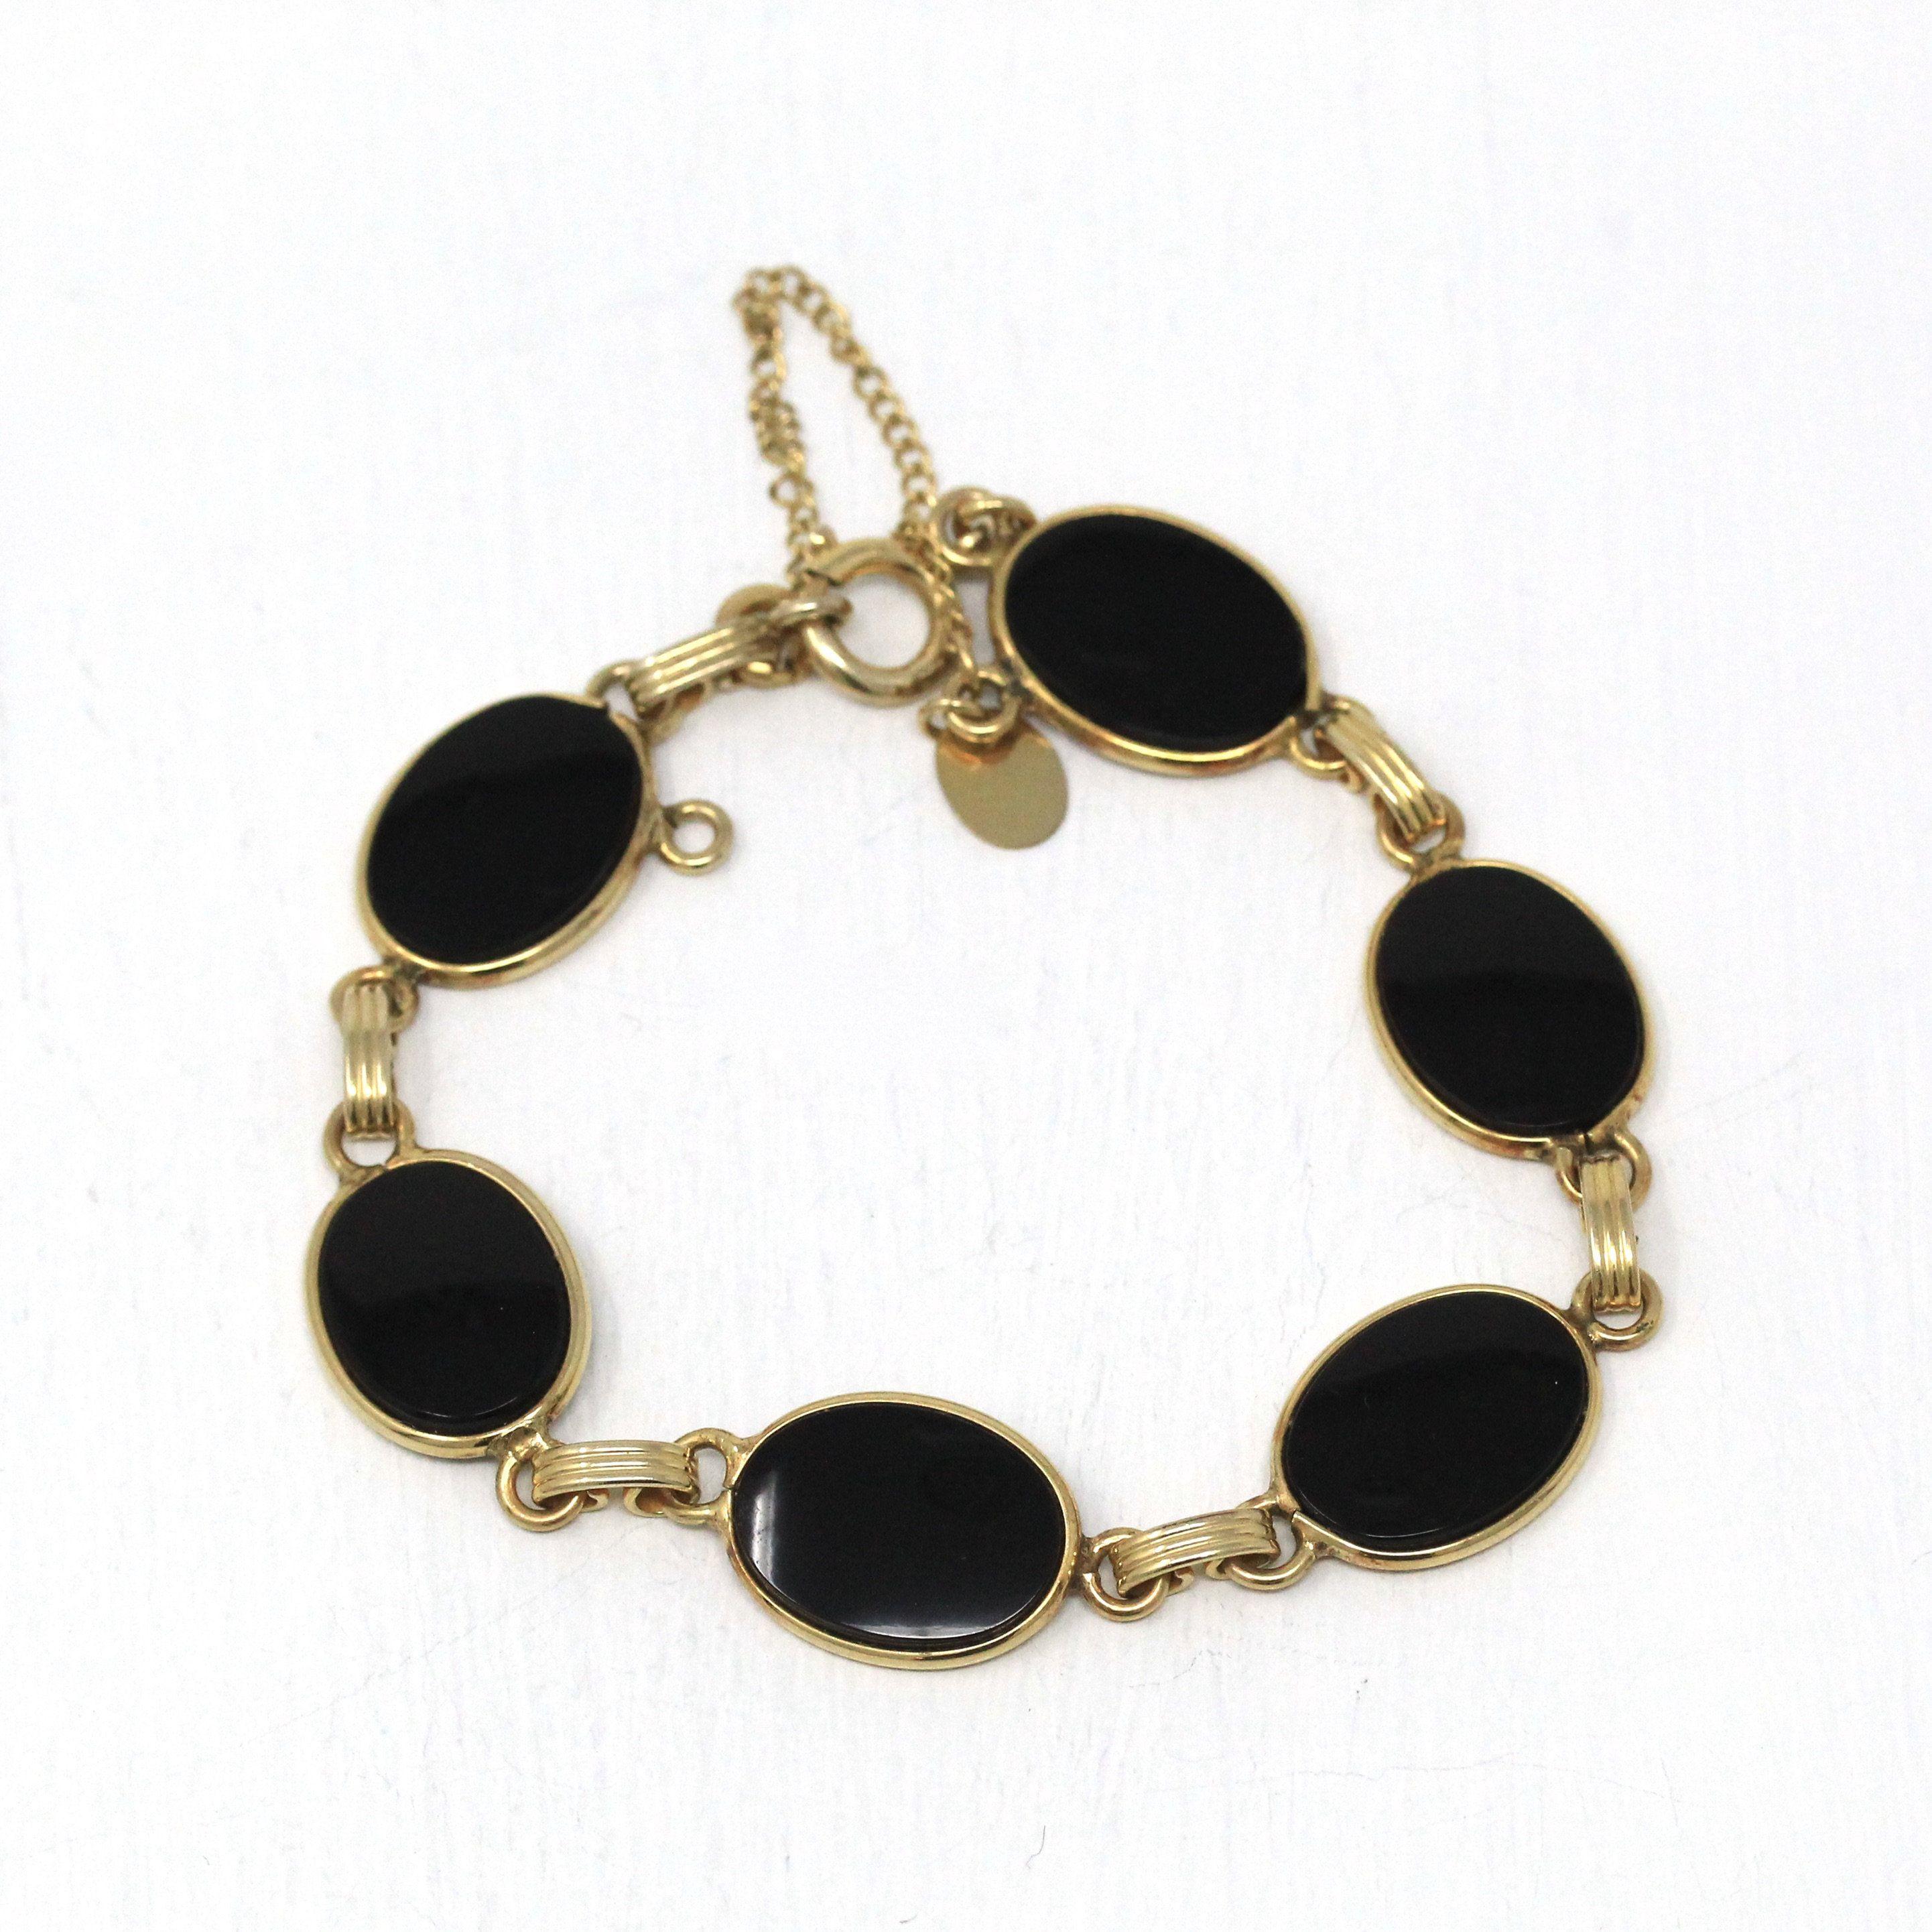 Gift for mom Statement bracelet Gorgeous Gold Cuff with Black Onyx Gemstones Gemstone bracelet